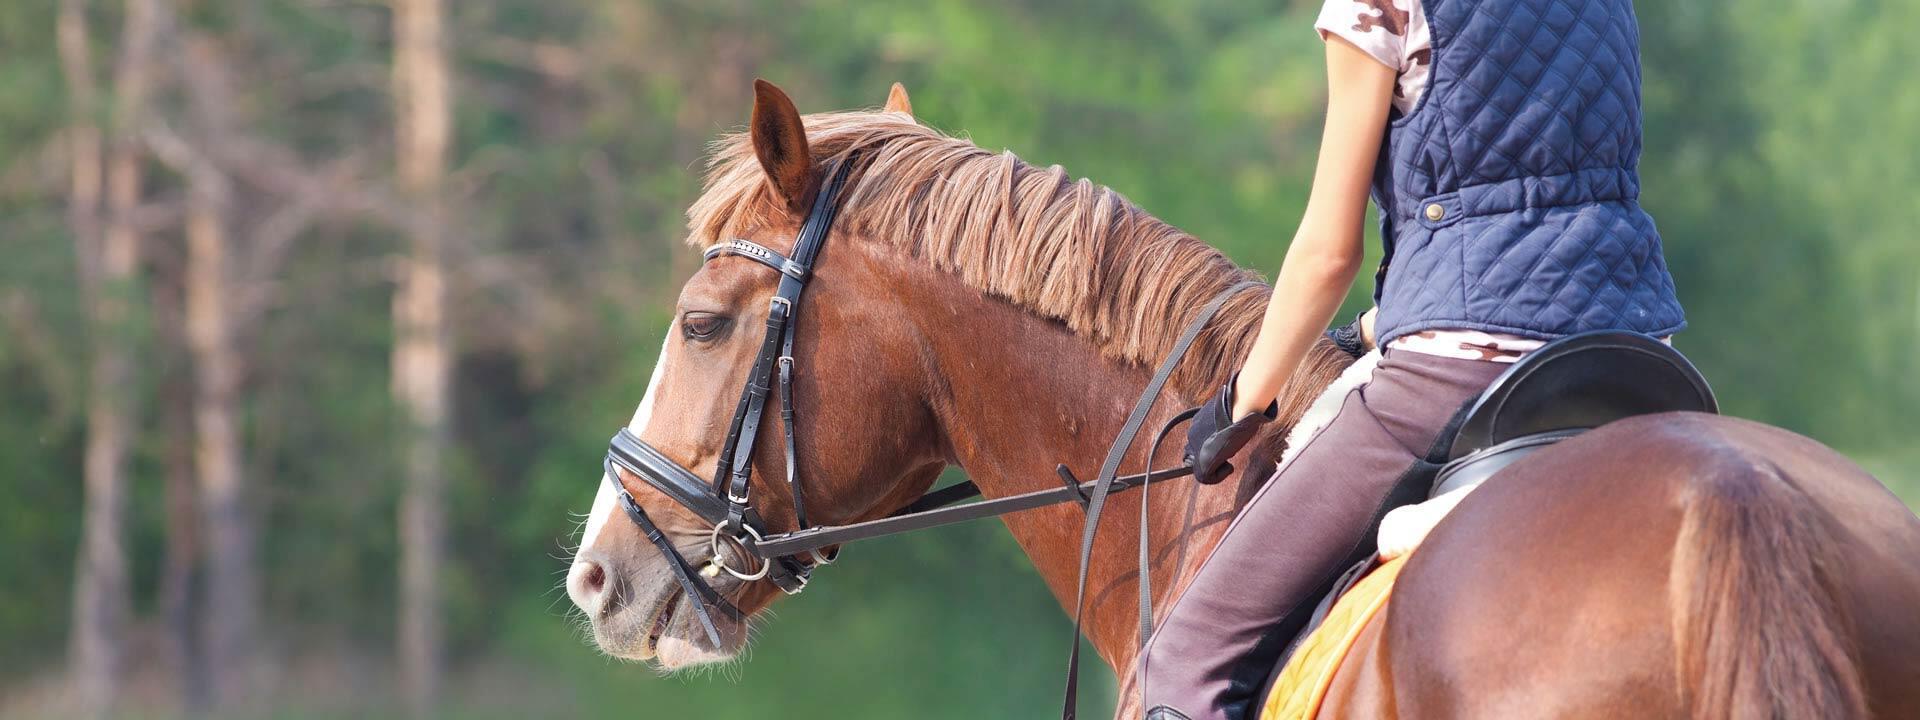 fortunaresort de sport-und-aktivurlaub-toskana 011